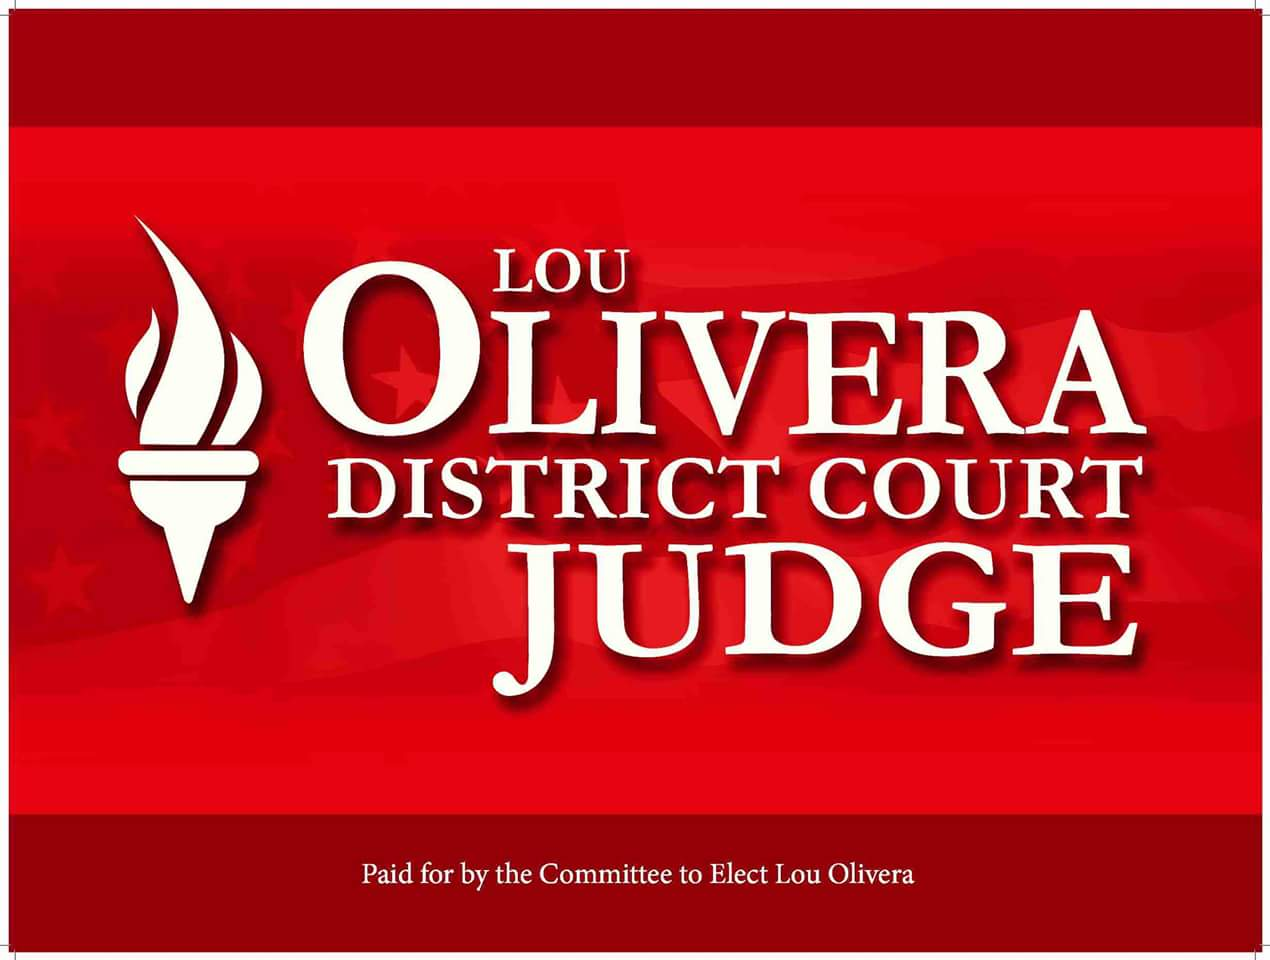 Judge Lou Olivera